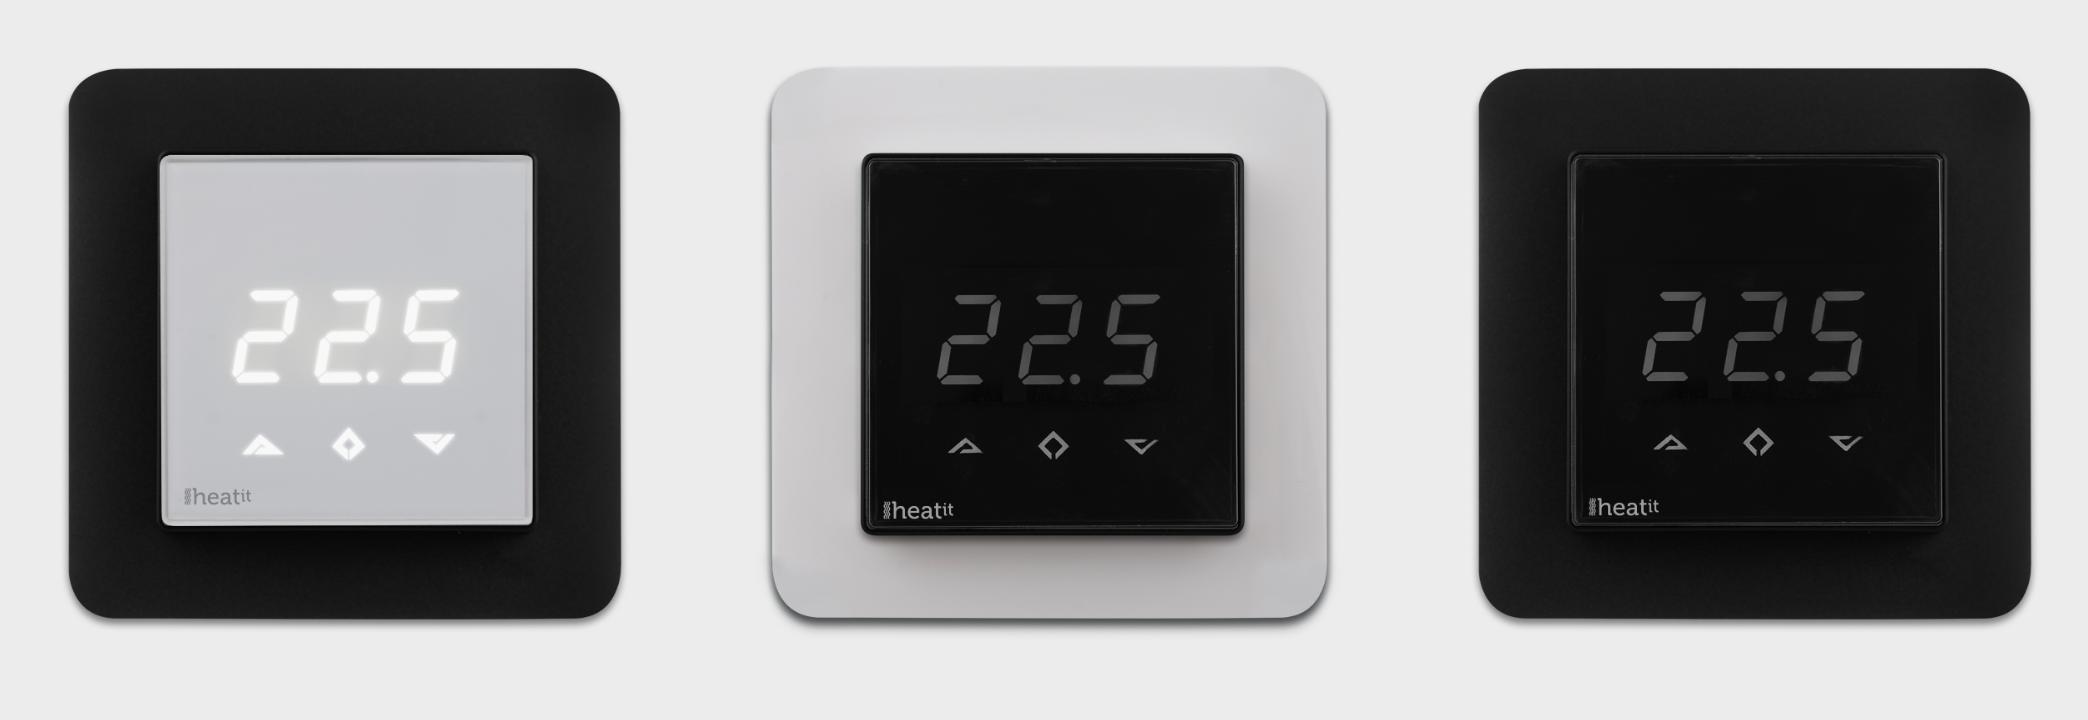 heatit-z-wave-white-front-black-frame